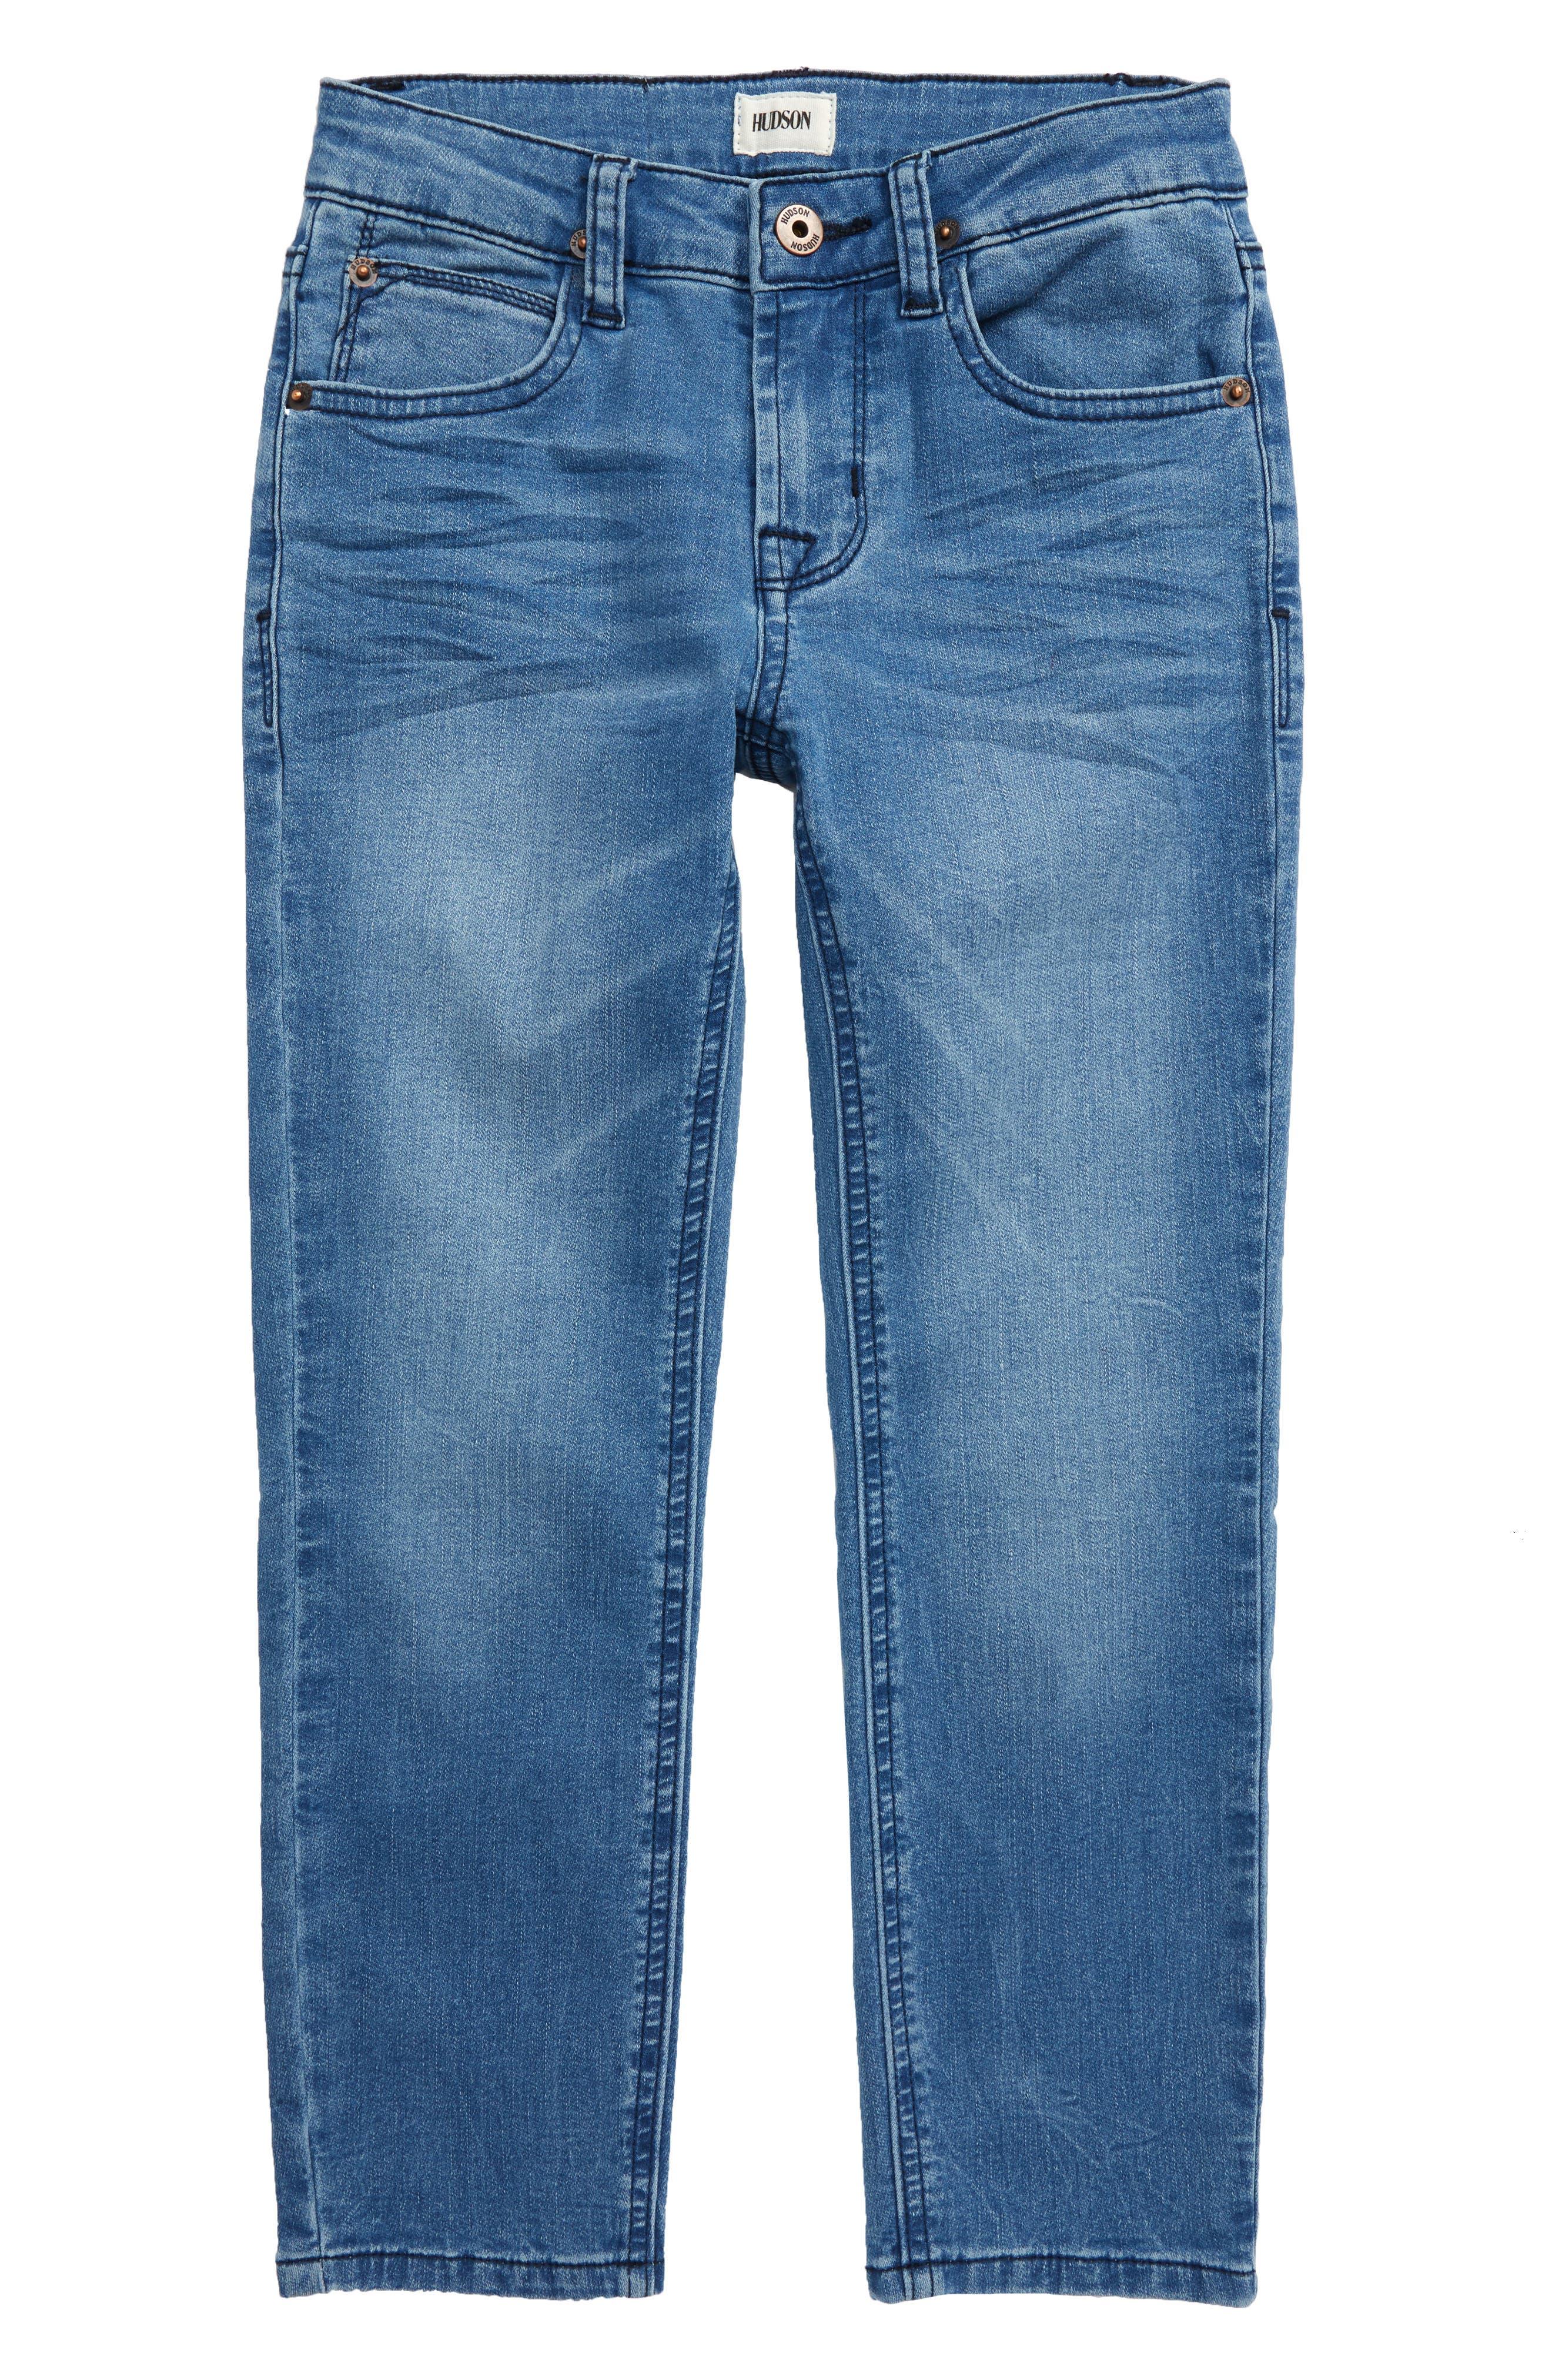 Boys Hudson Jeans Jagger Slim Fit Straight Leg Jeans